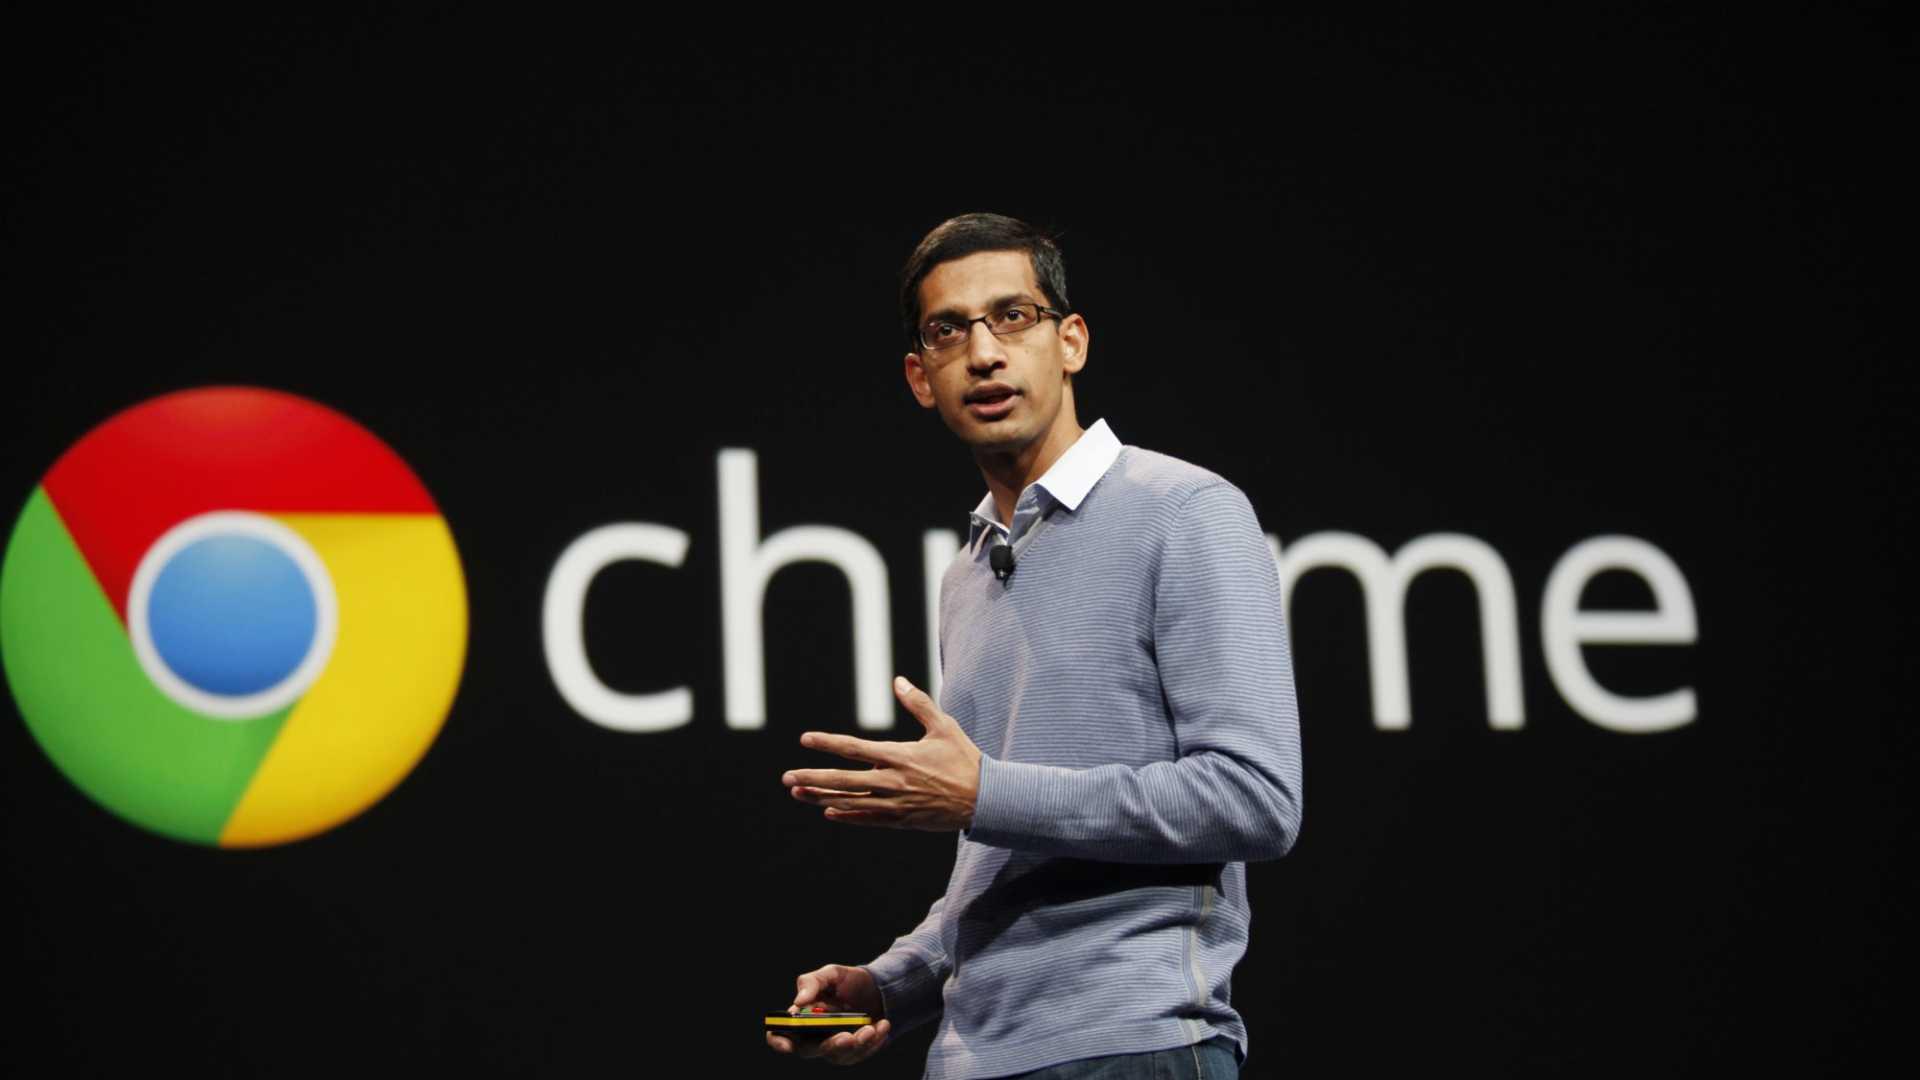 Sundar Pichai speaking in 2012